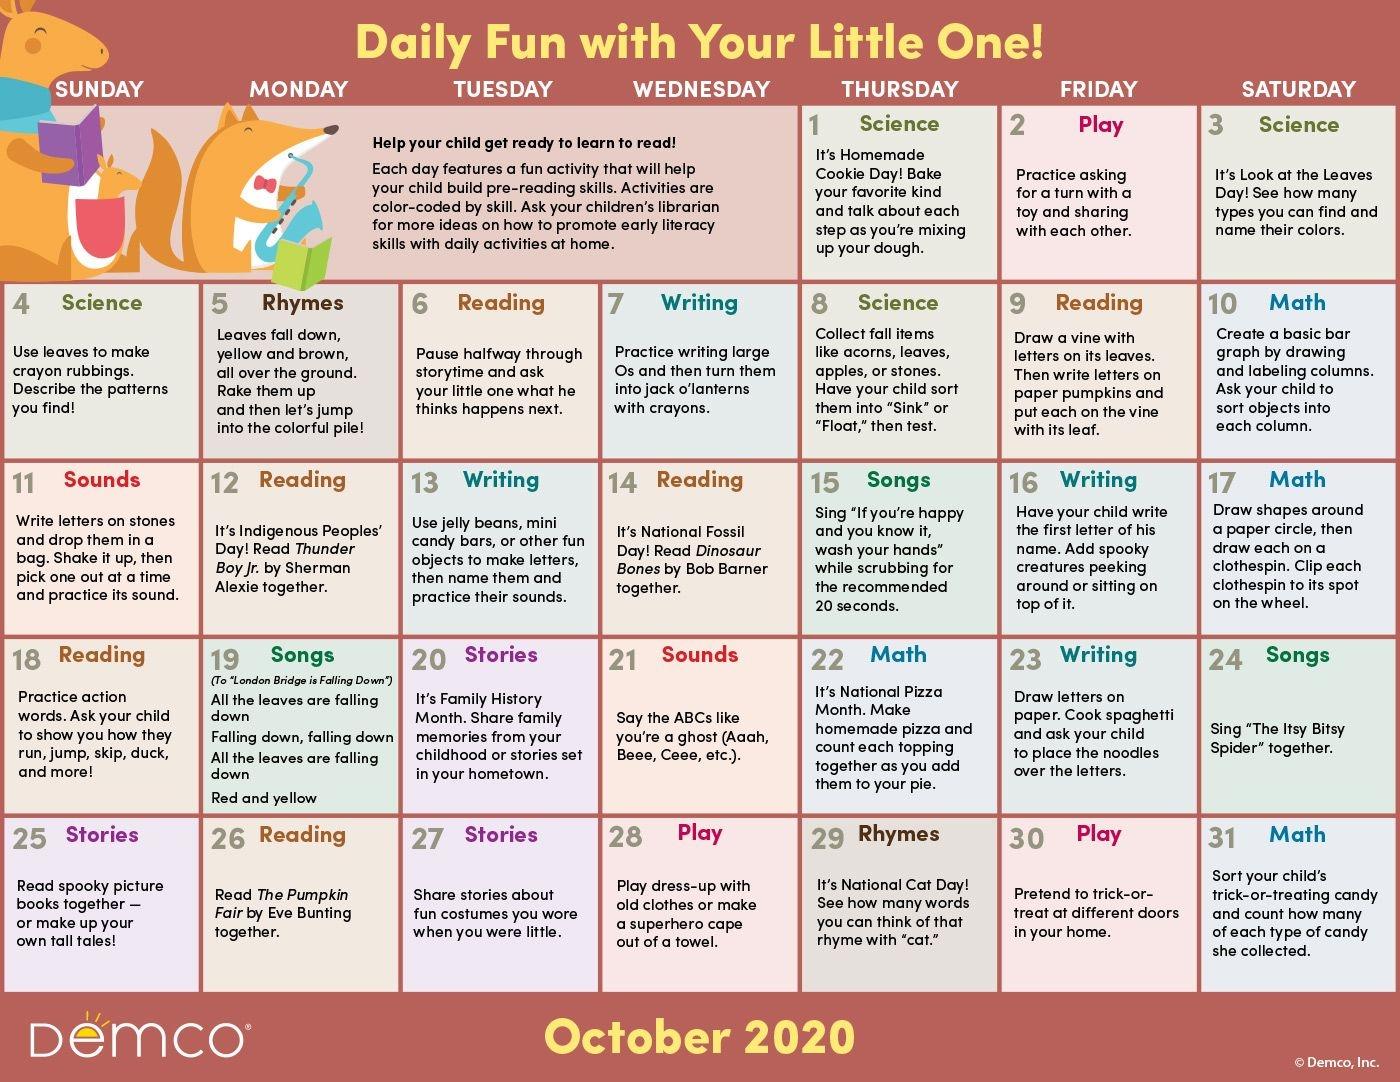 Early Literacy Activities — October 2020: Activities, Books